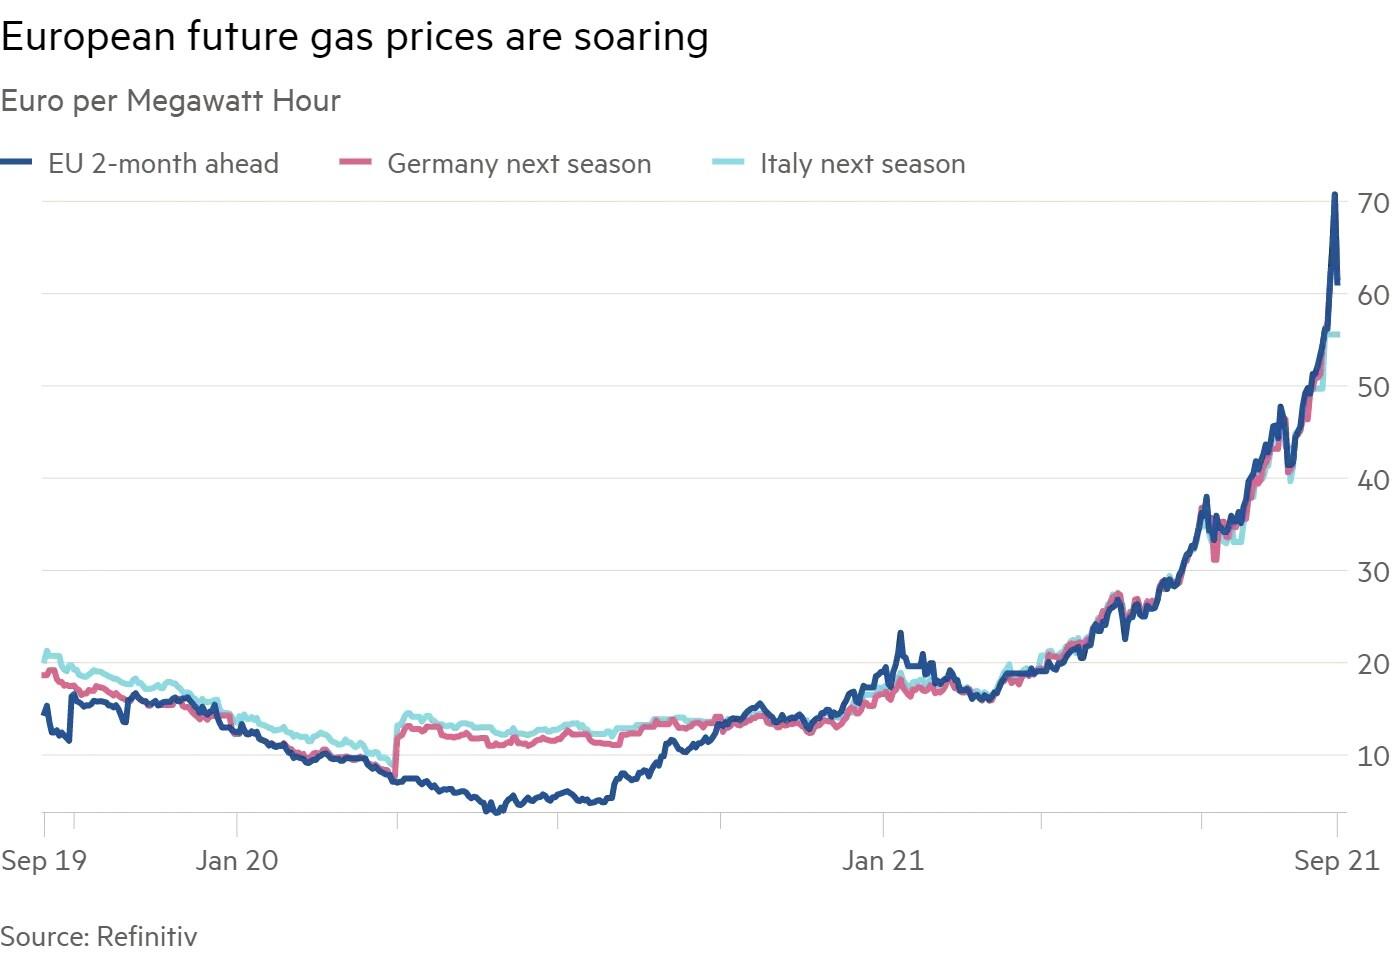 European future gas prices are soaring